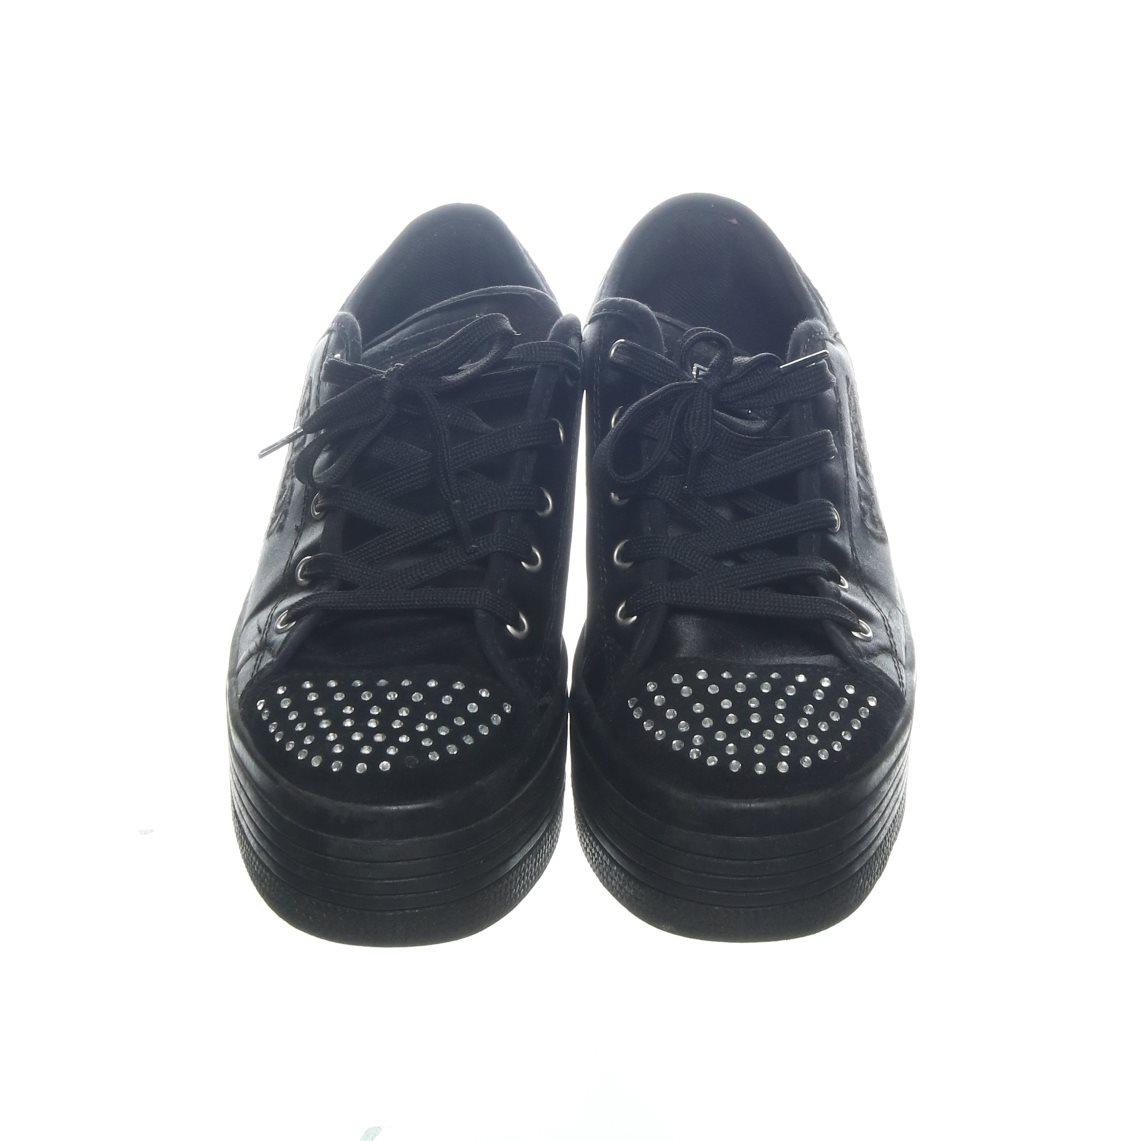 the best attitude 28f16 0df3c Guess, Sneakers, Strl  40, Svart